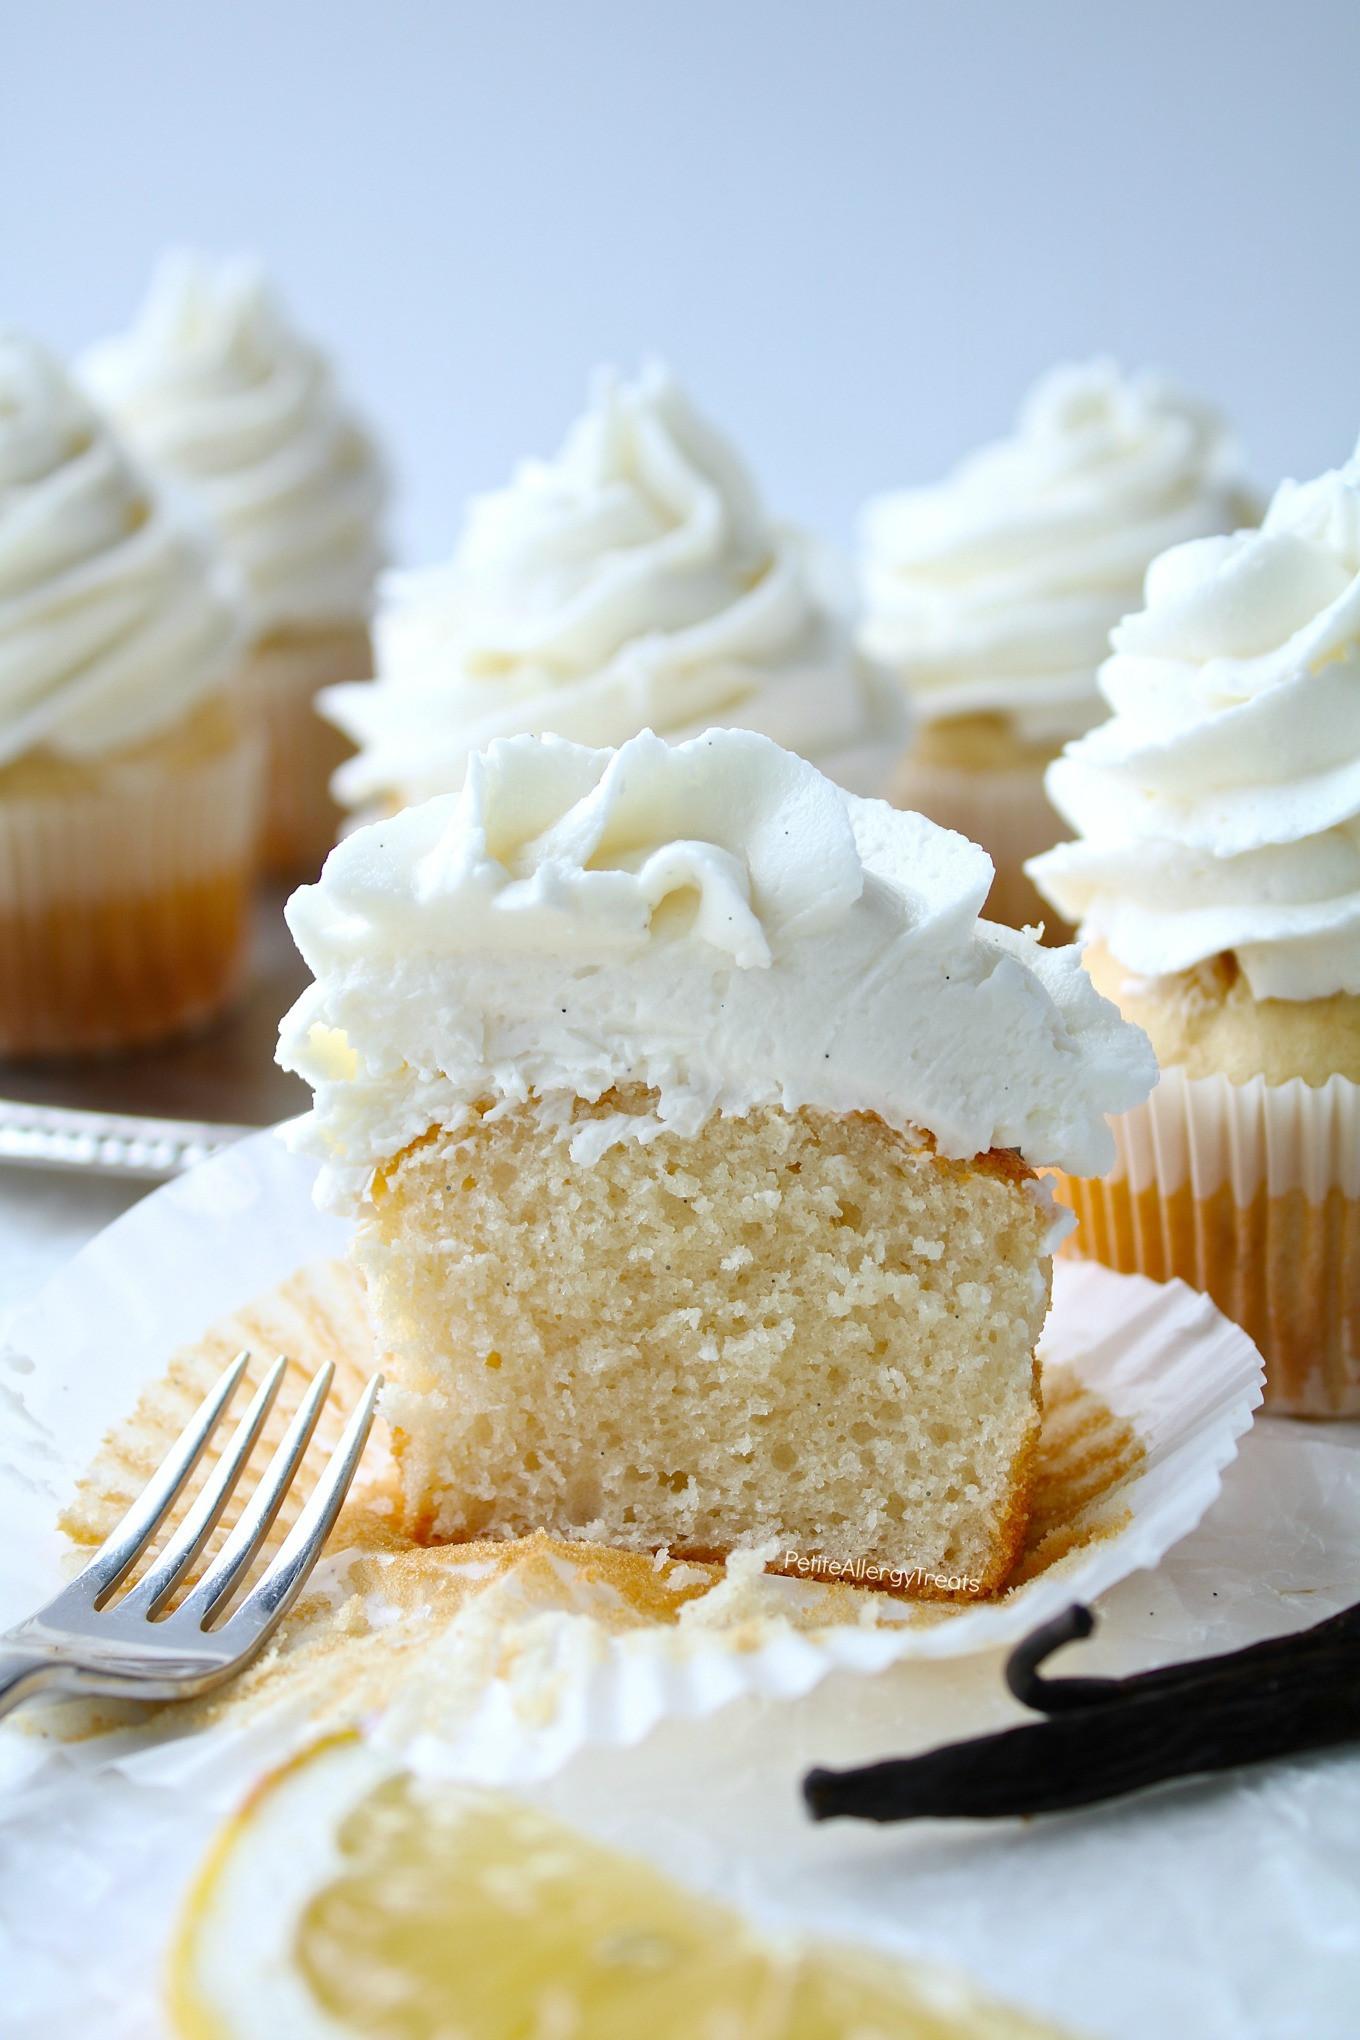 Dairy Free Vanilla Cupcakes  Bakery Style Gluten Free Vanilla Cupcakes & Allergy Amulet